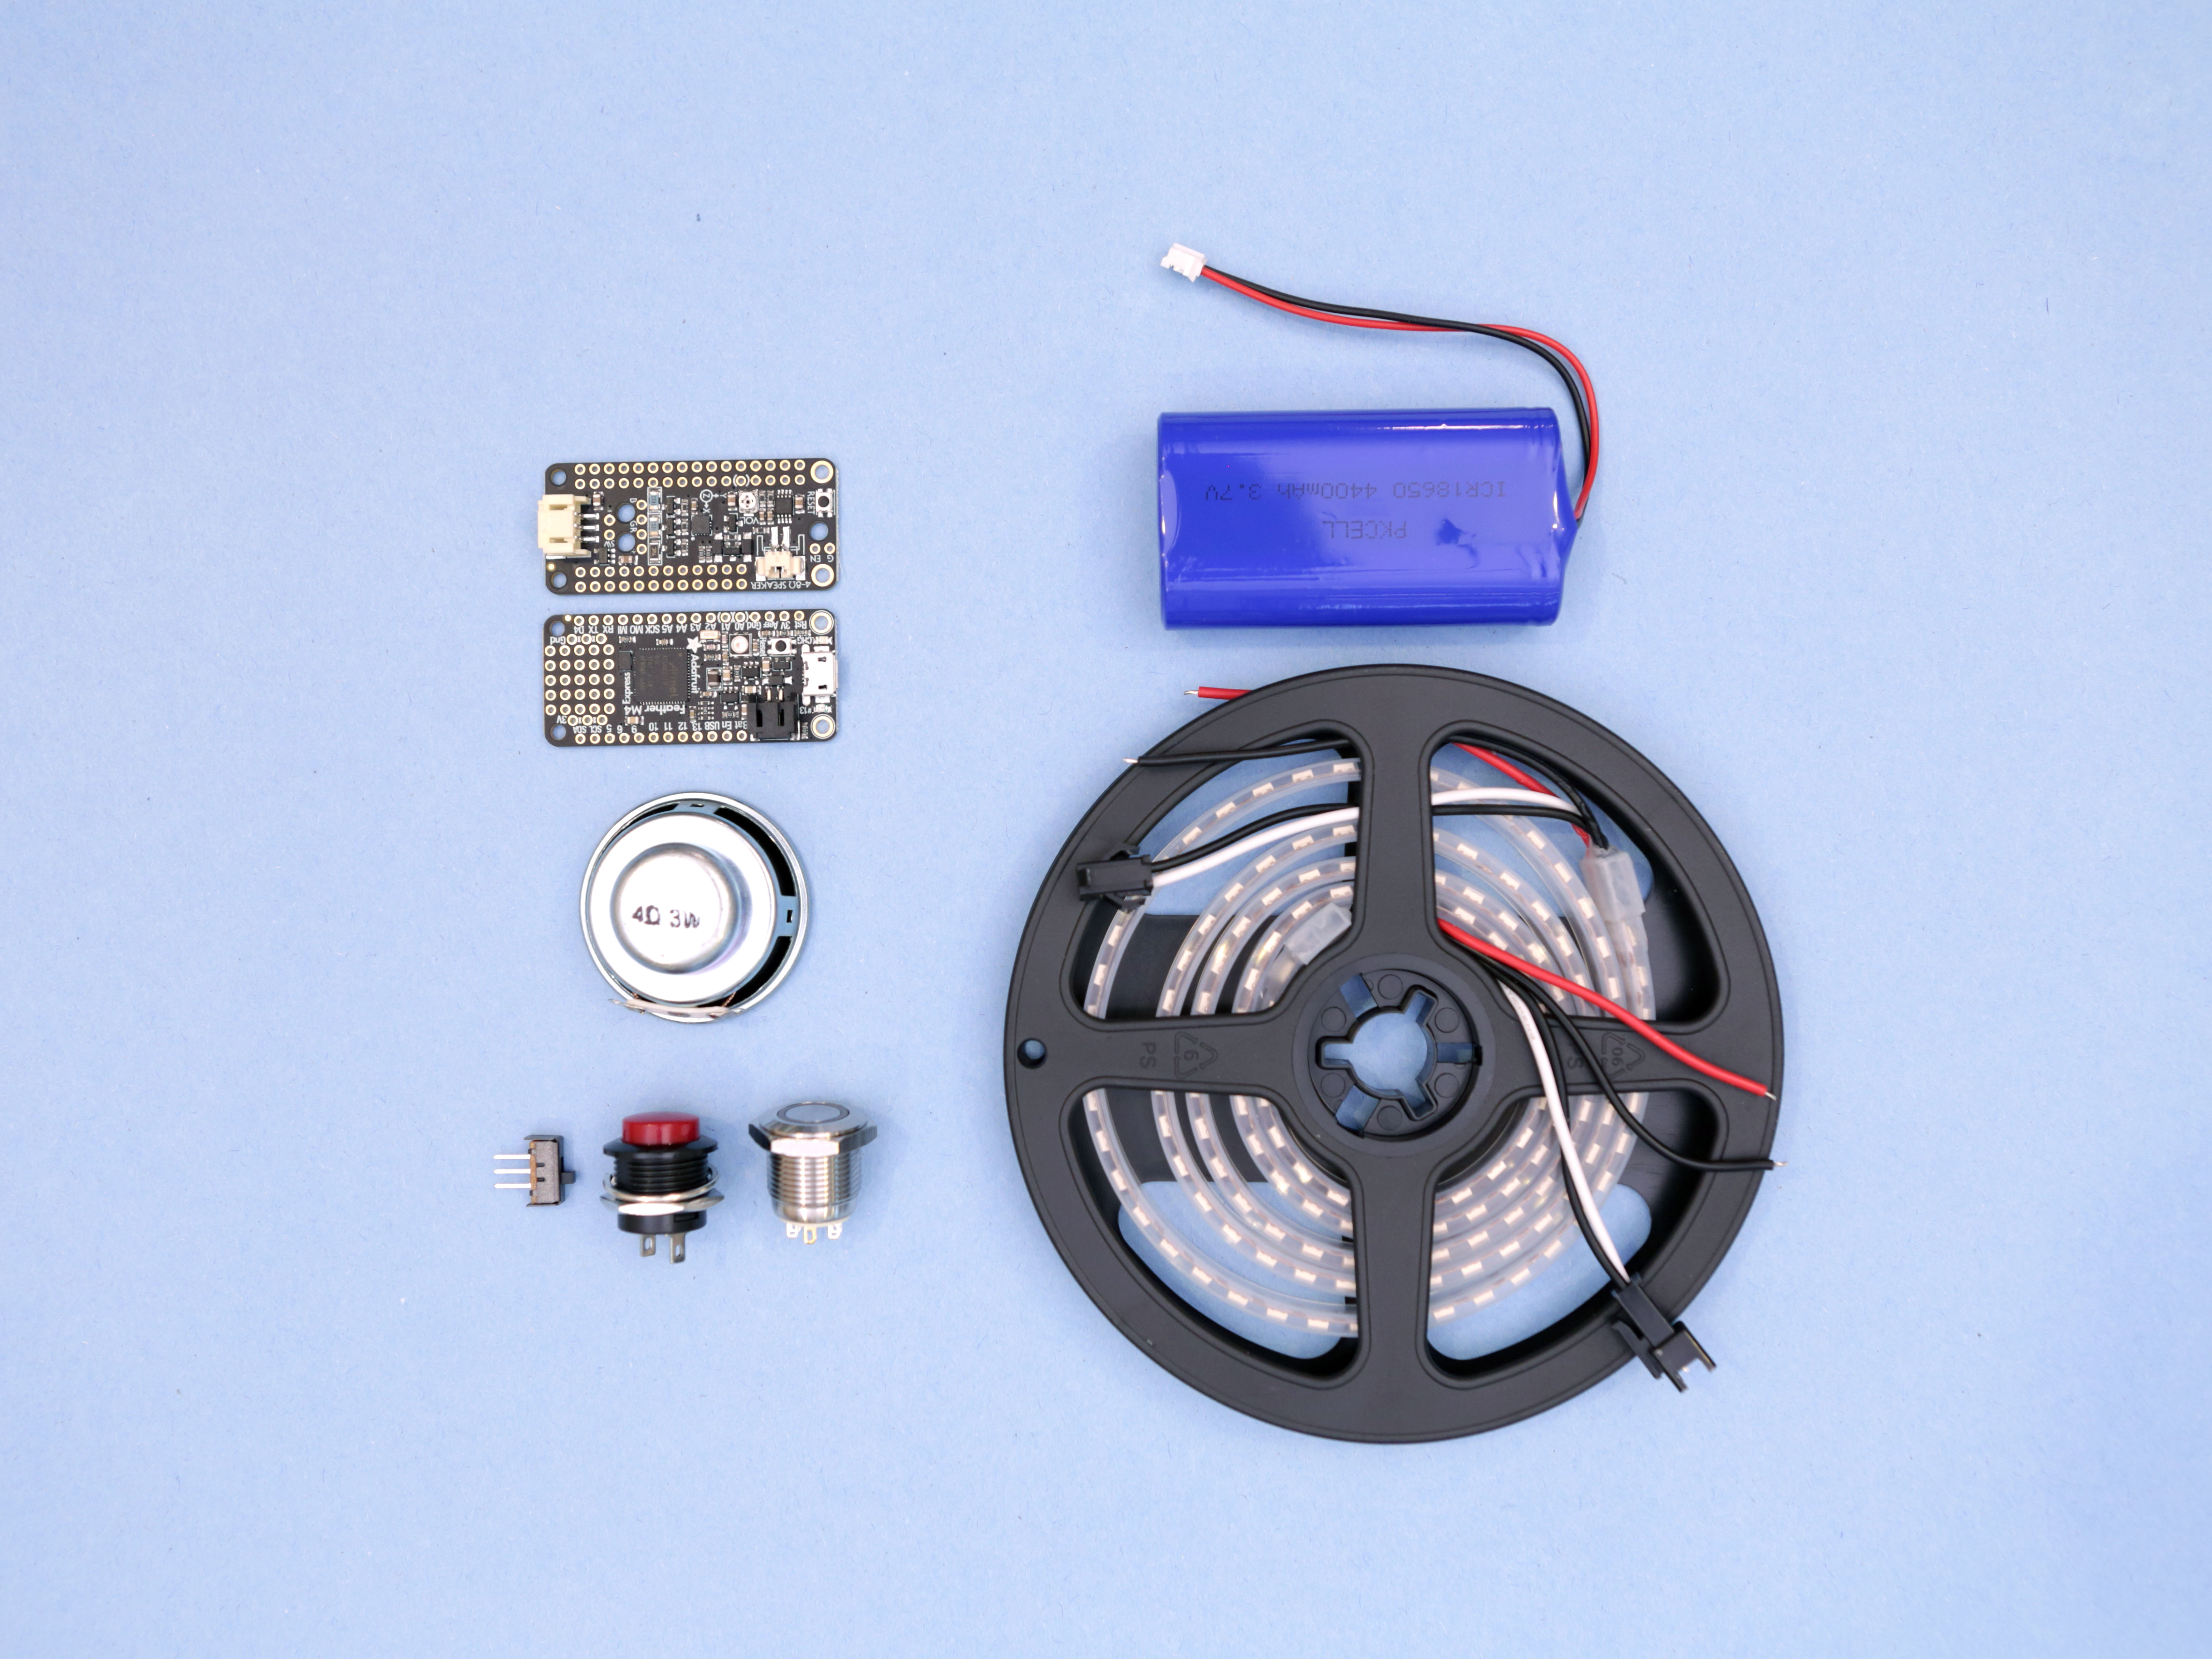 3d_printing_parts-electronics-crop.jpg